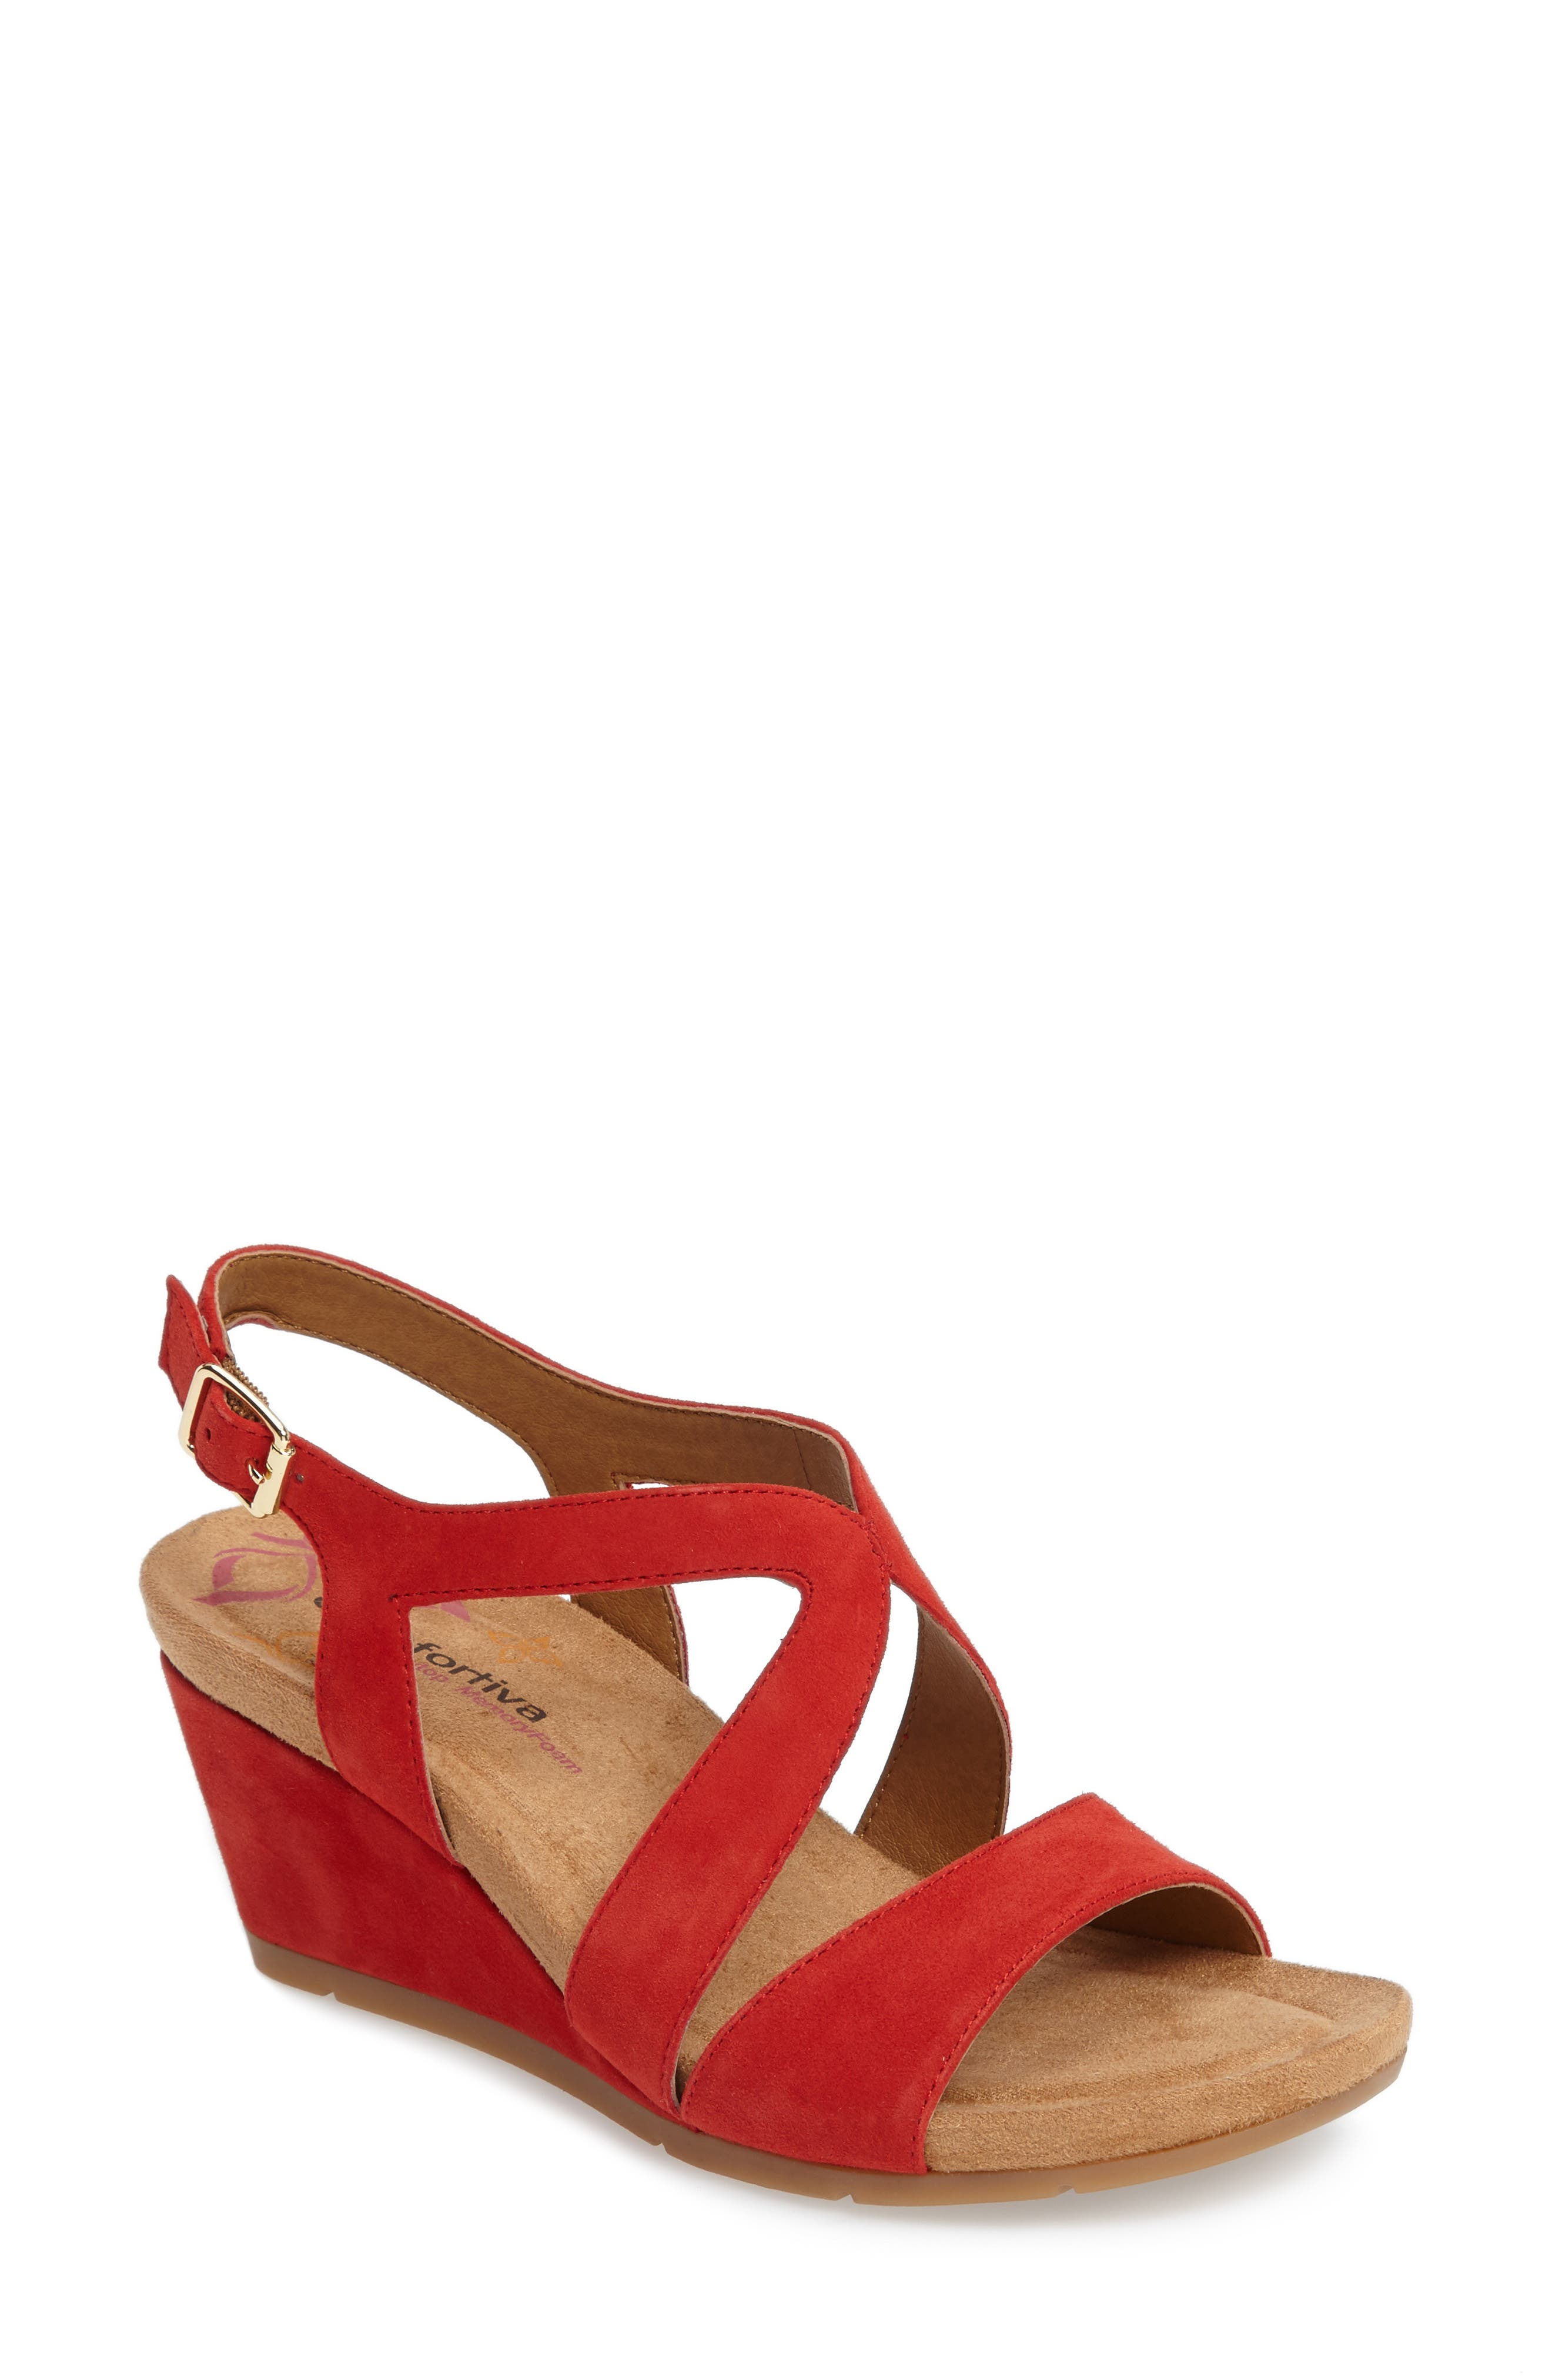 Main Image - Comfortiva Vandy Sandal (Women)